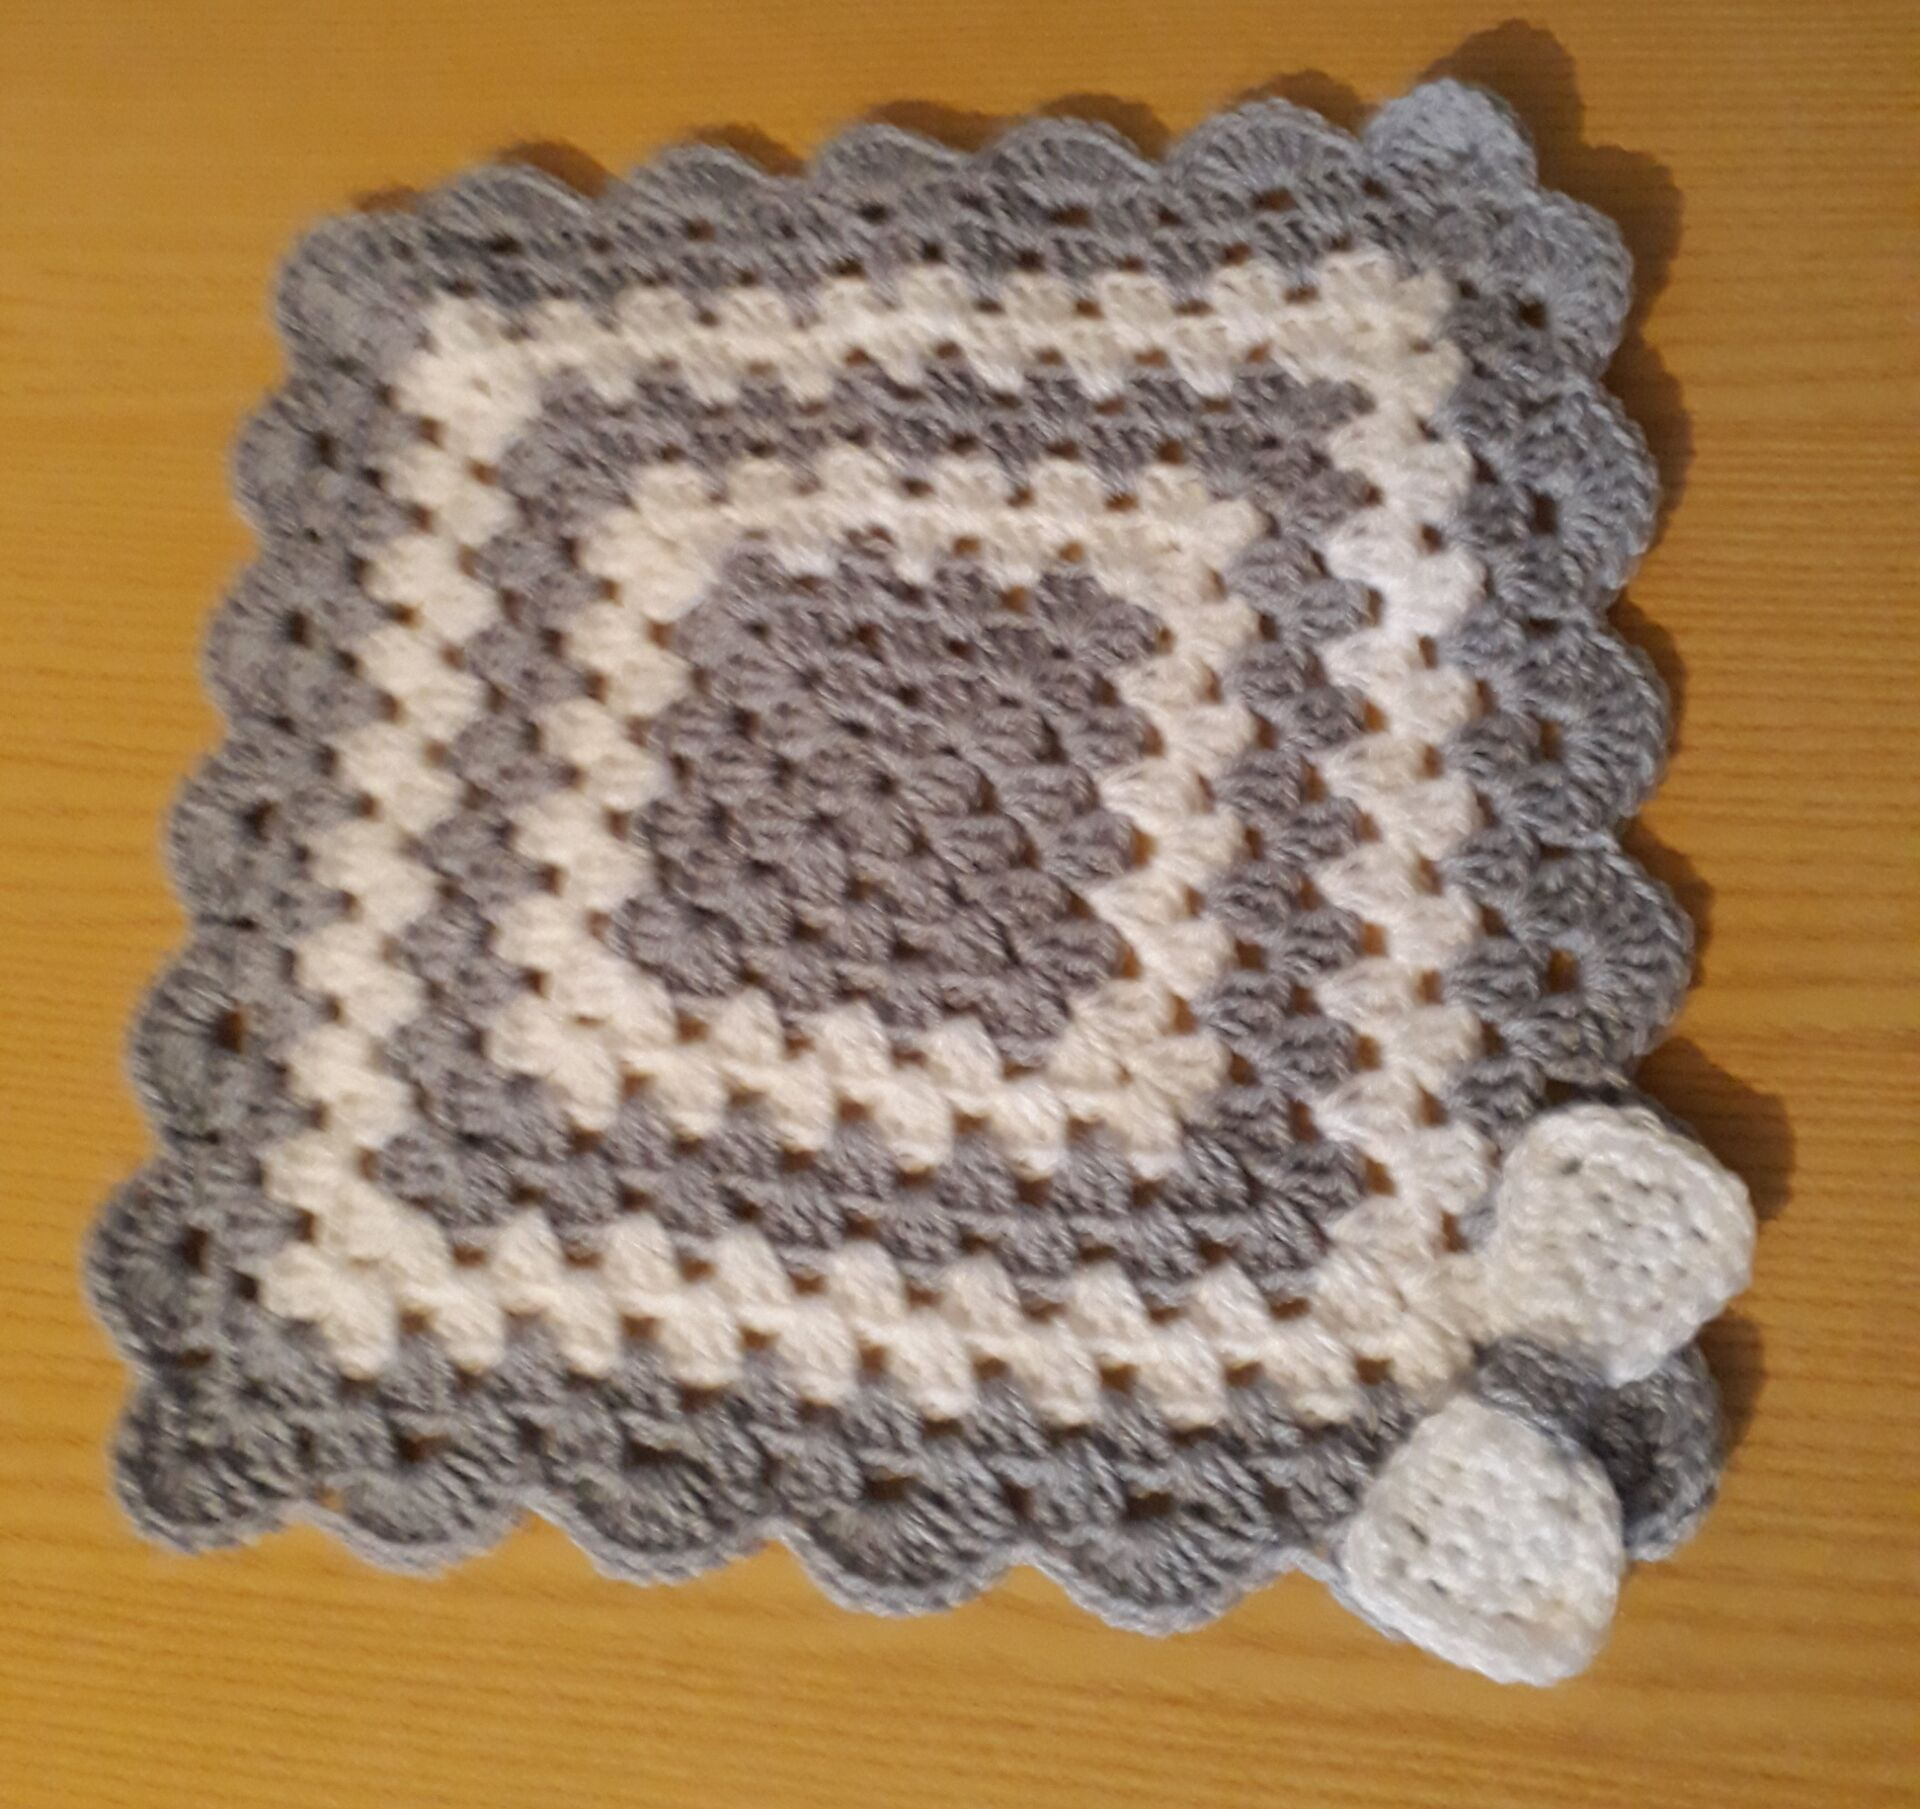 Crochet baby burial blankets CRADLE OF LOVE grey born 22-25 weeks